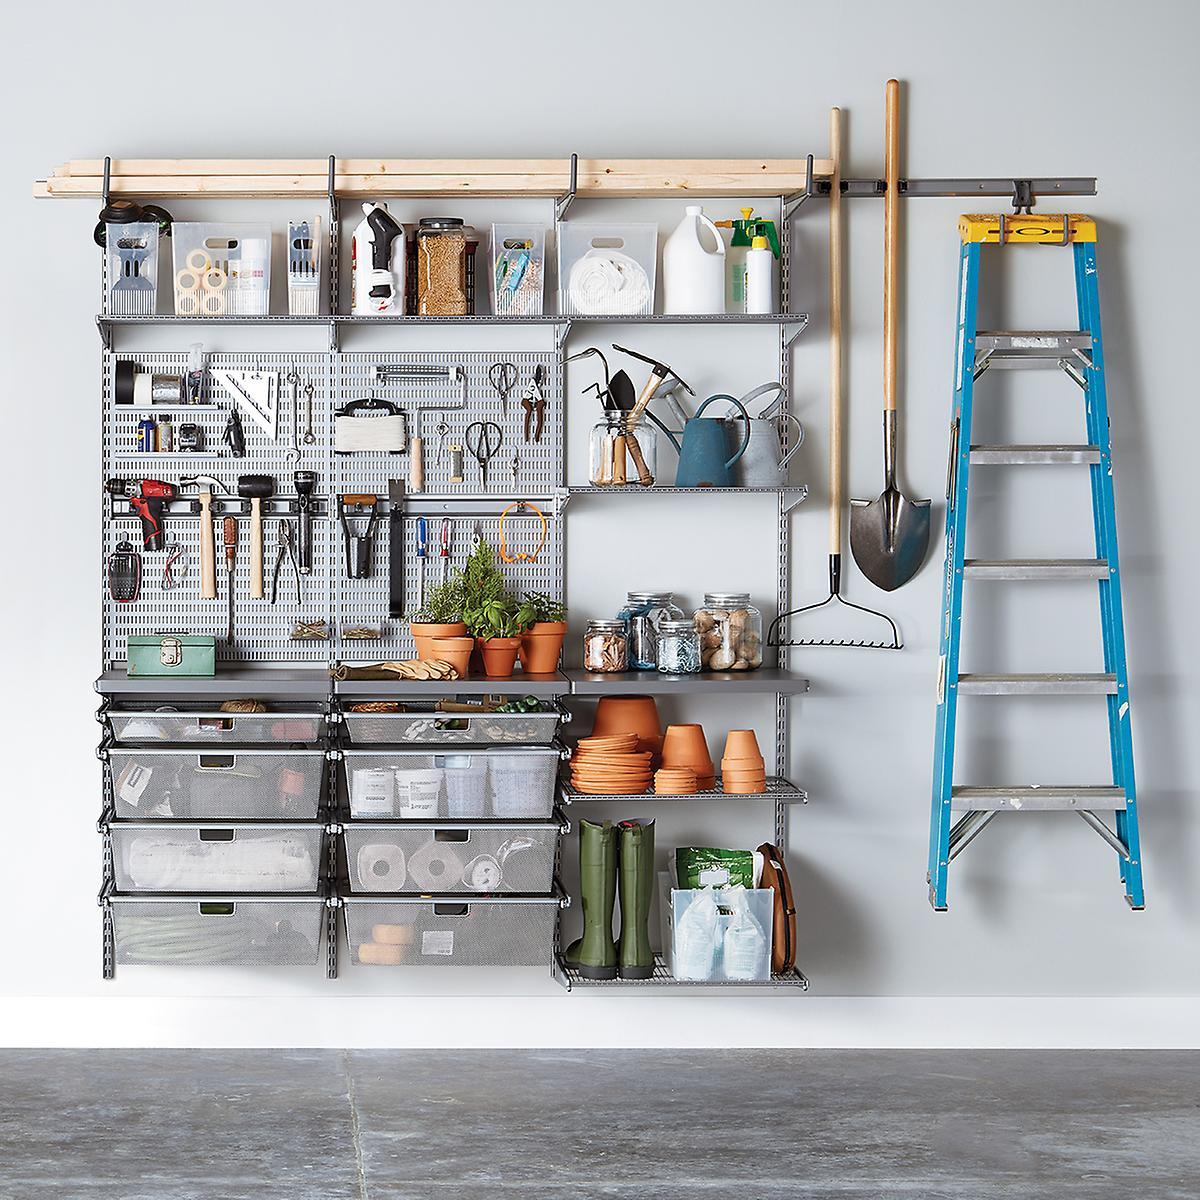 Garage-organization-ideas-wall-racks